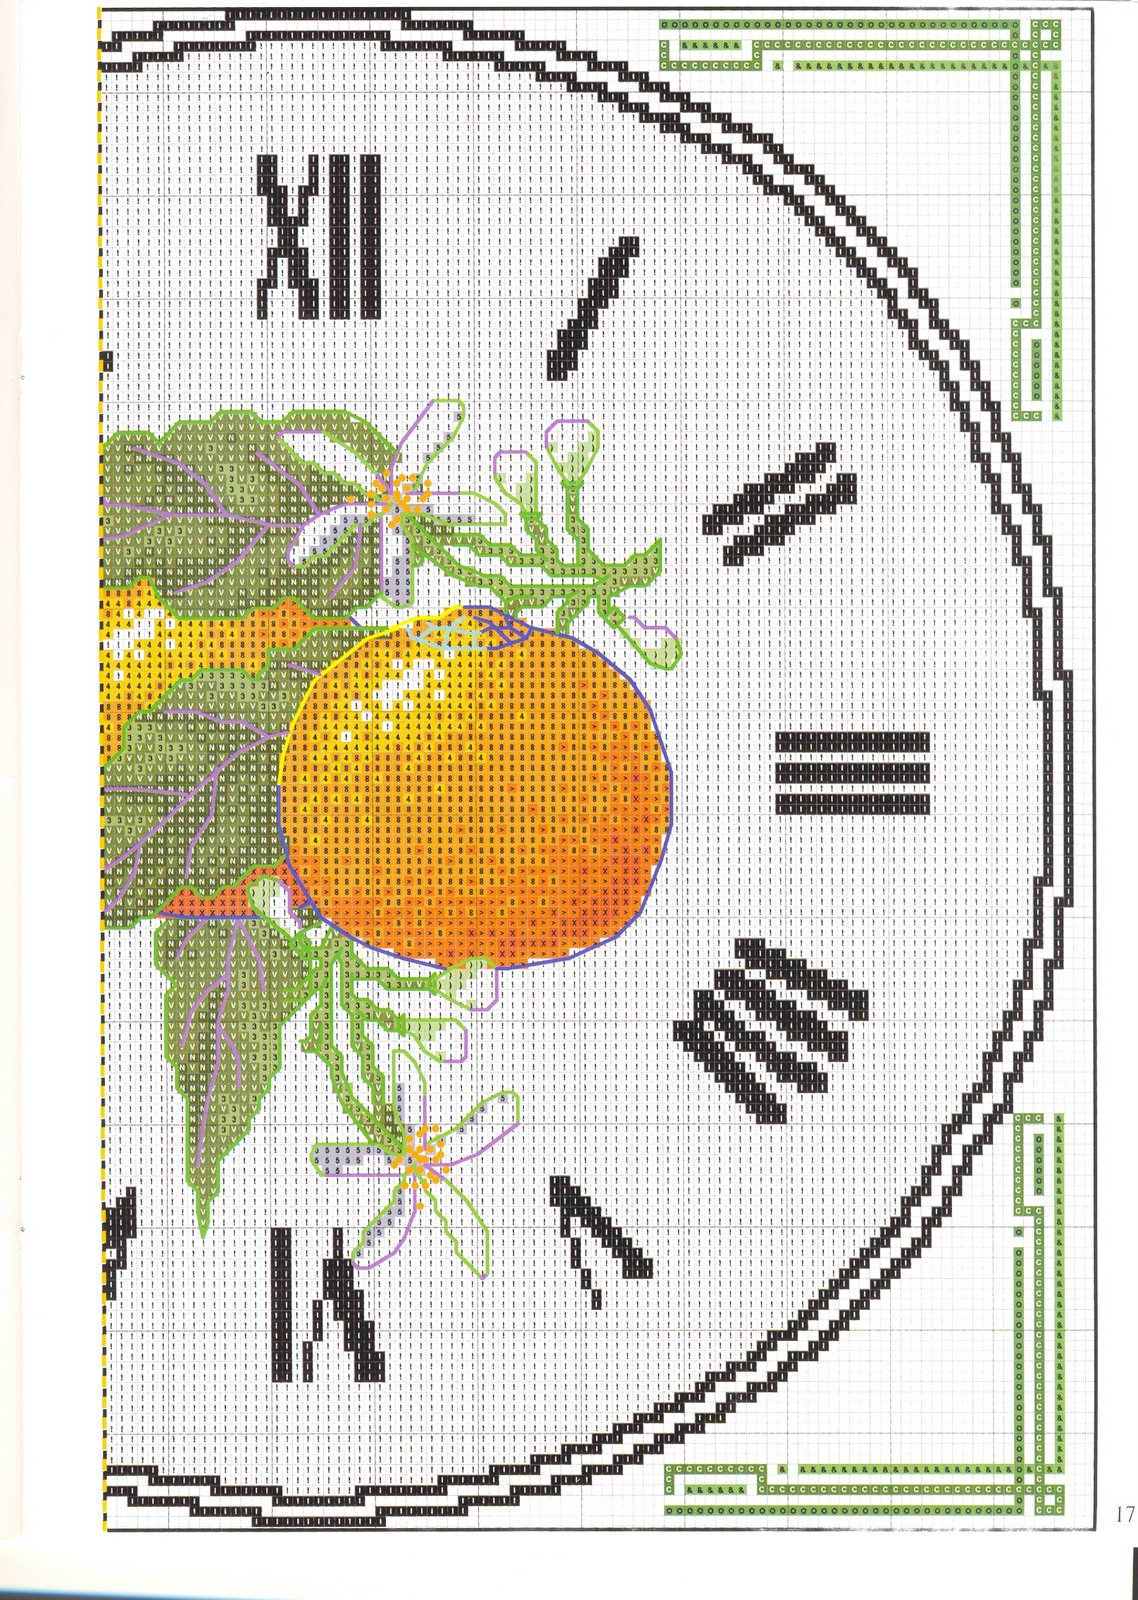 Orologio punto croce arance 3 punto for Orologio punto croce schemi gratis